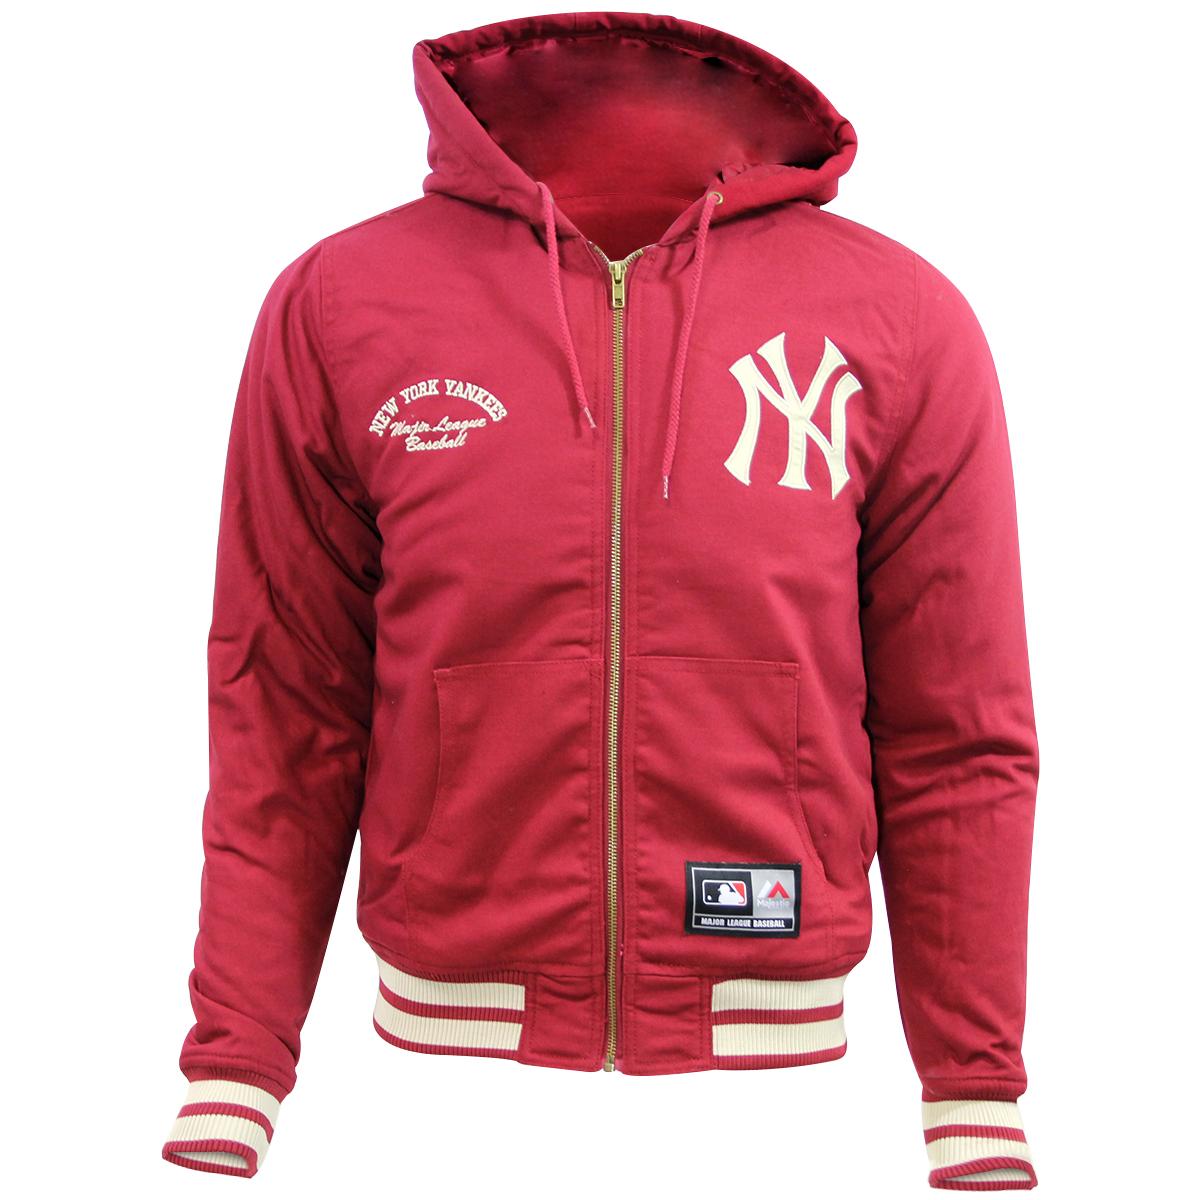 watch 98475 1d13d Details about Majestic DEERING NEW YORK YANKEE HOODIE Men Major League  Baseball Jacket